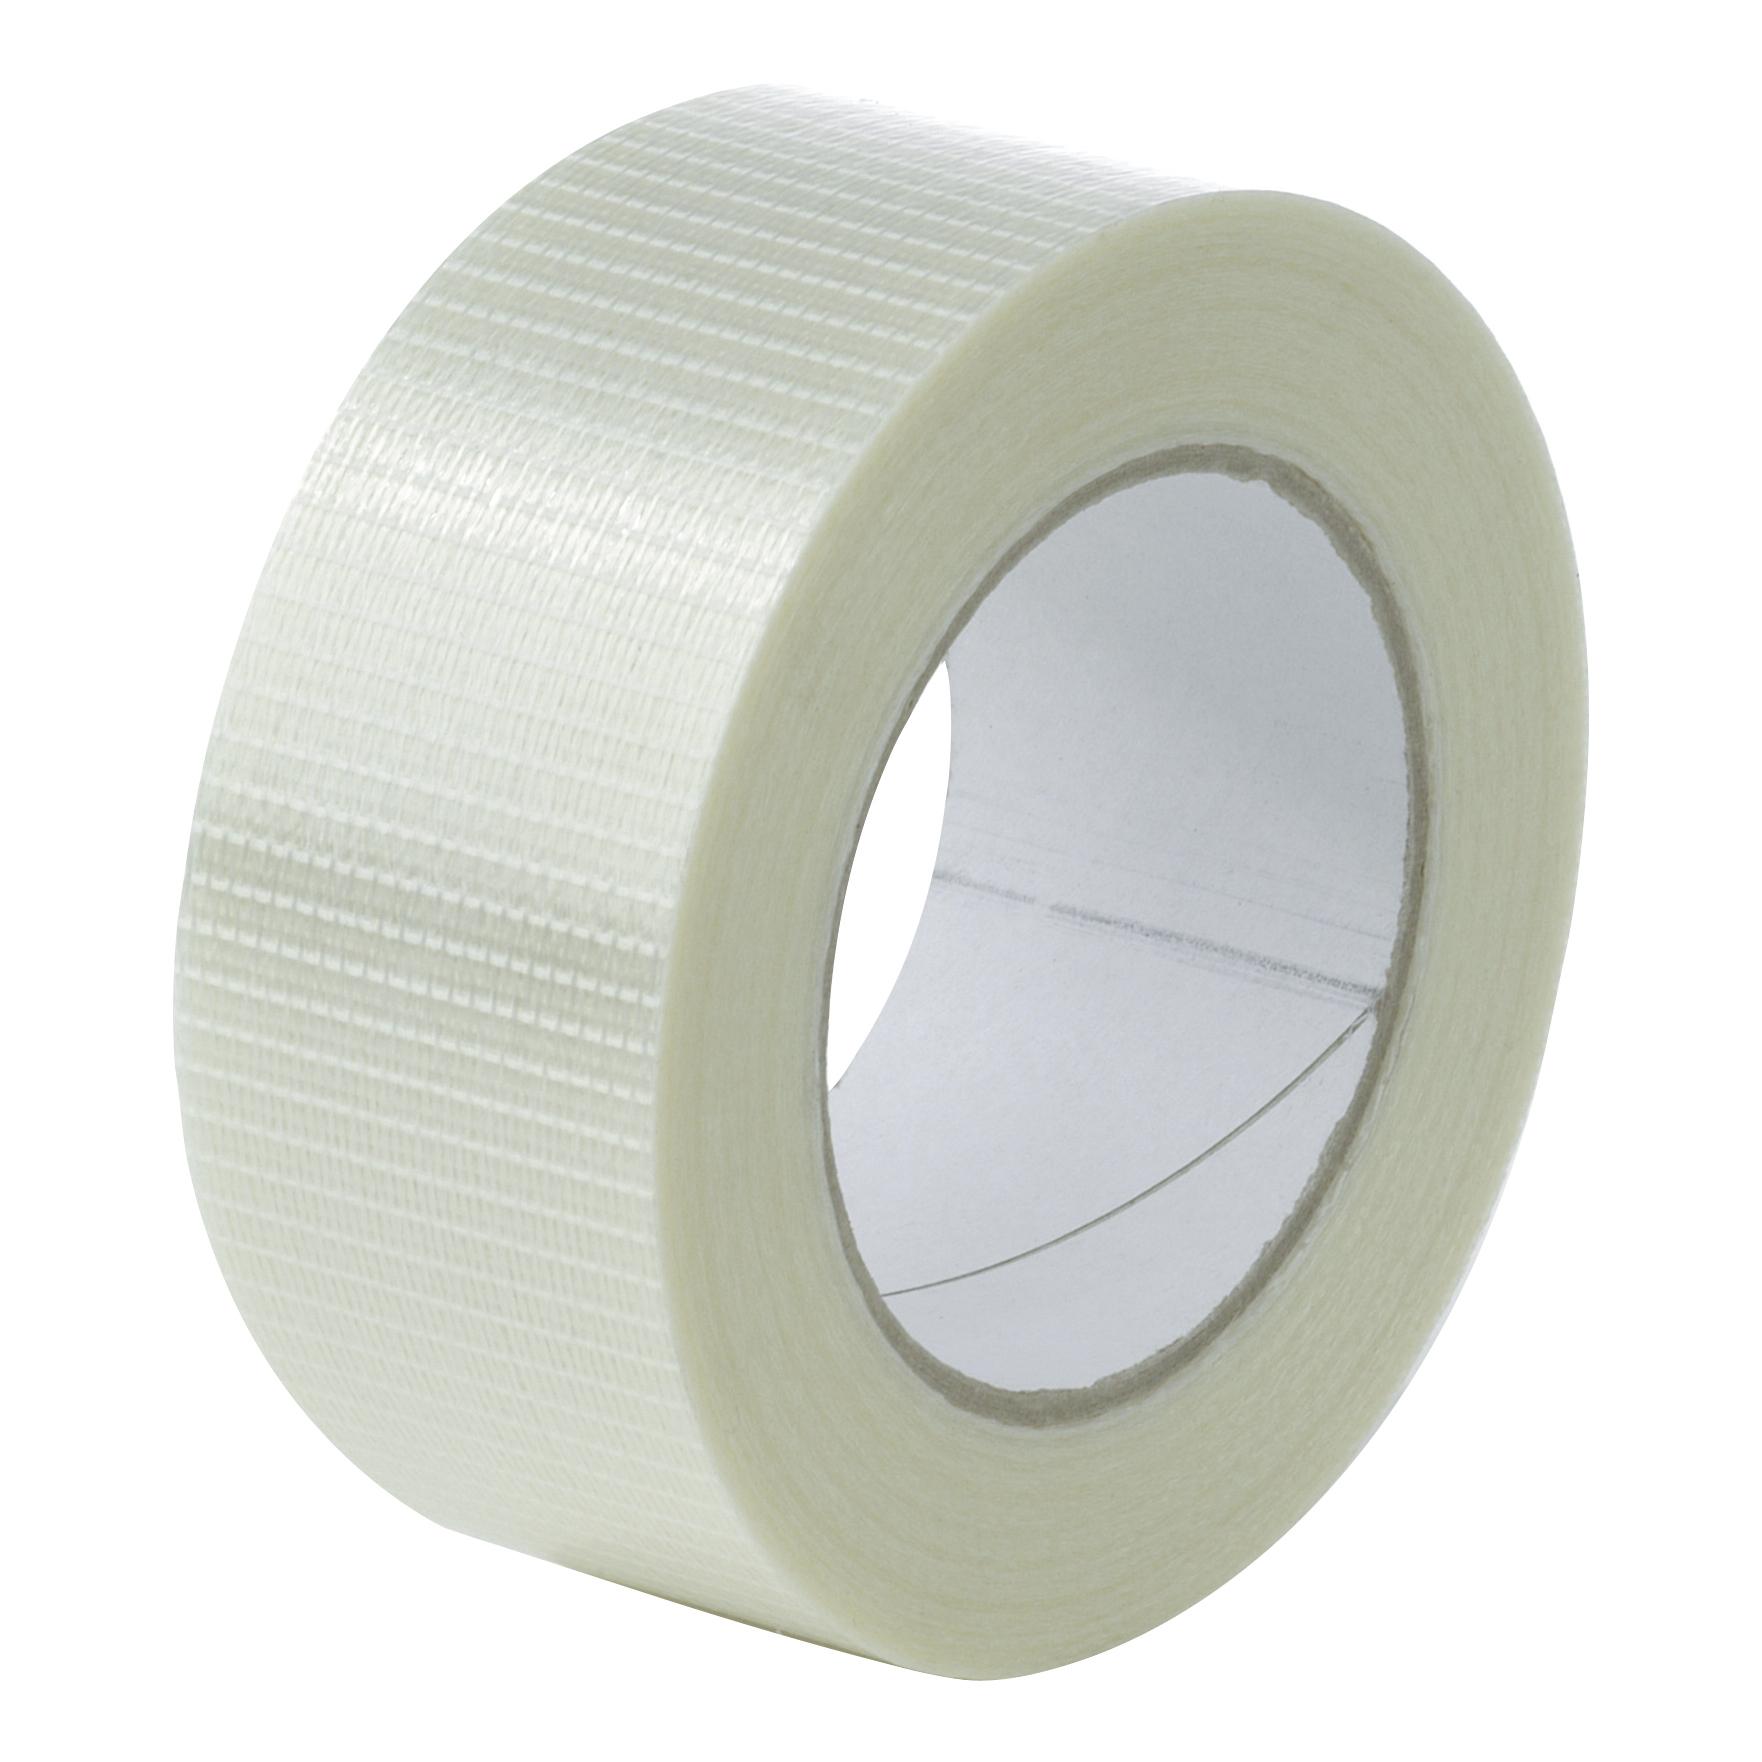 Cross Weave Tape 50mm x 50m Ref CRT50 Pack 18